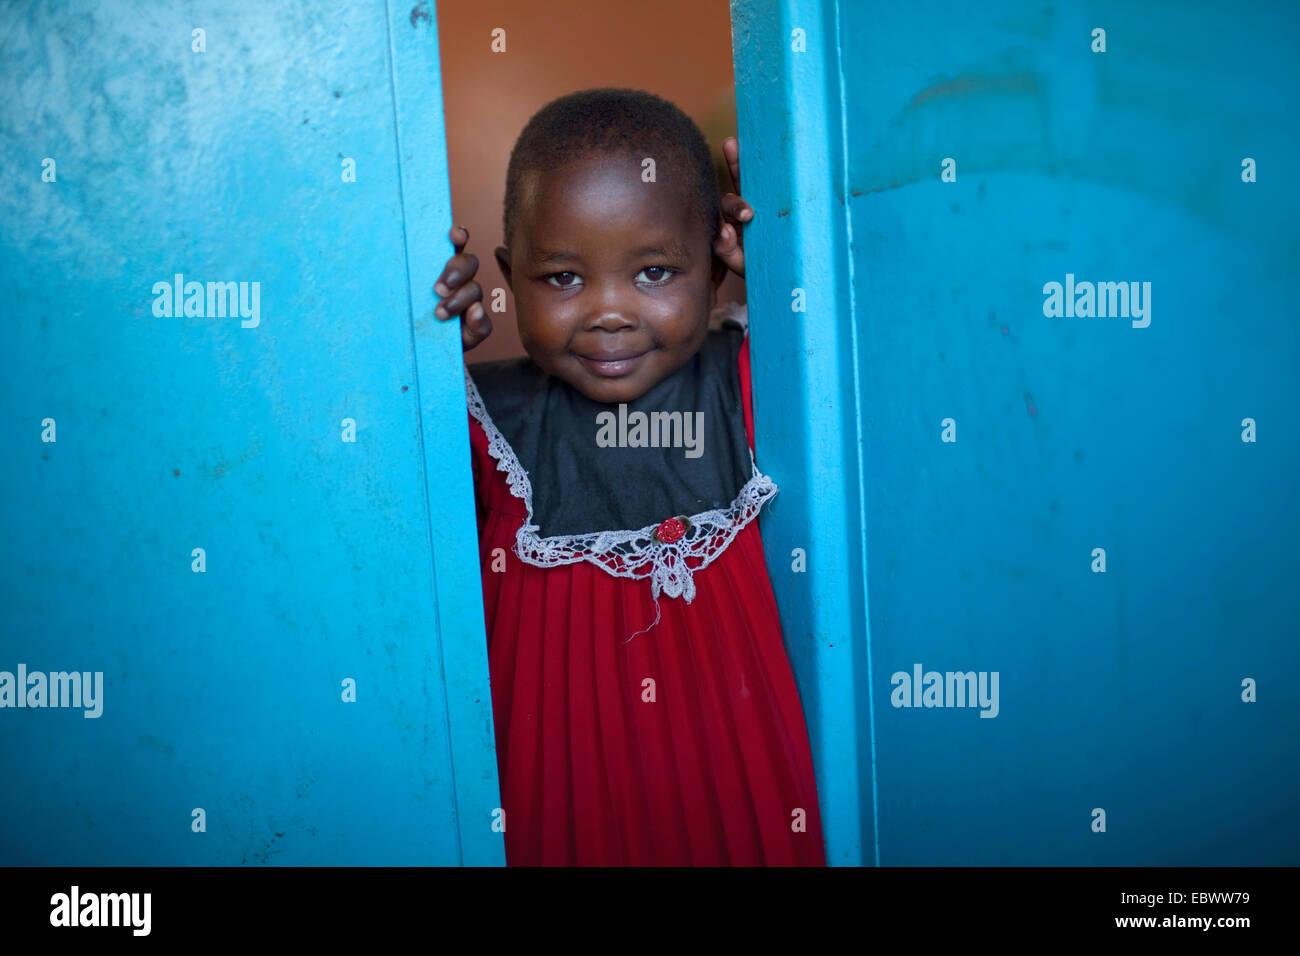 Petite fille dans un tissu rouge à la recherche d'une porte bleue, BURUNDI, Bujumbura Mairie, Bujumbura Photo Stock